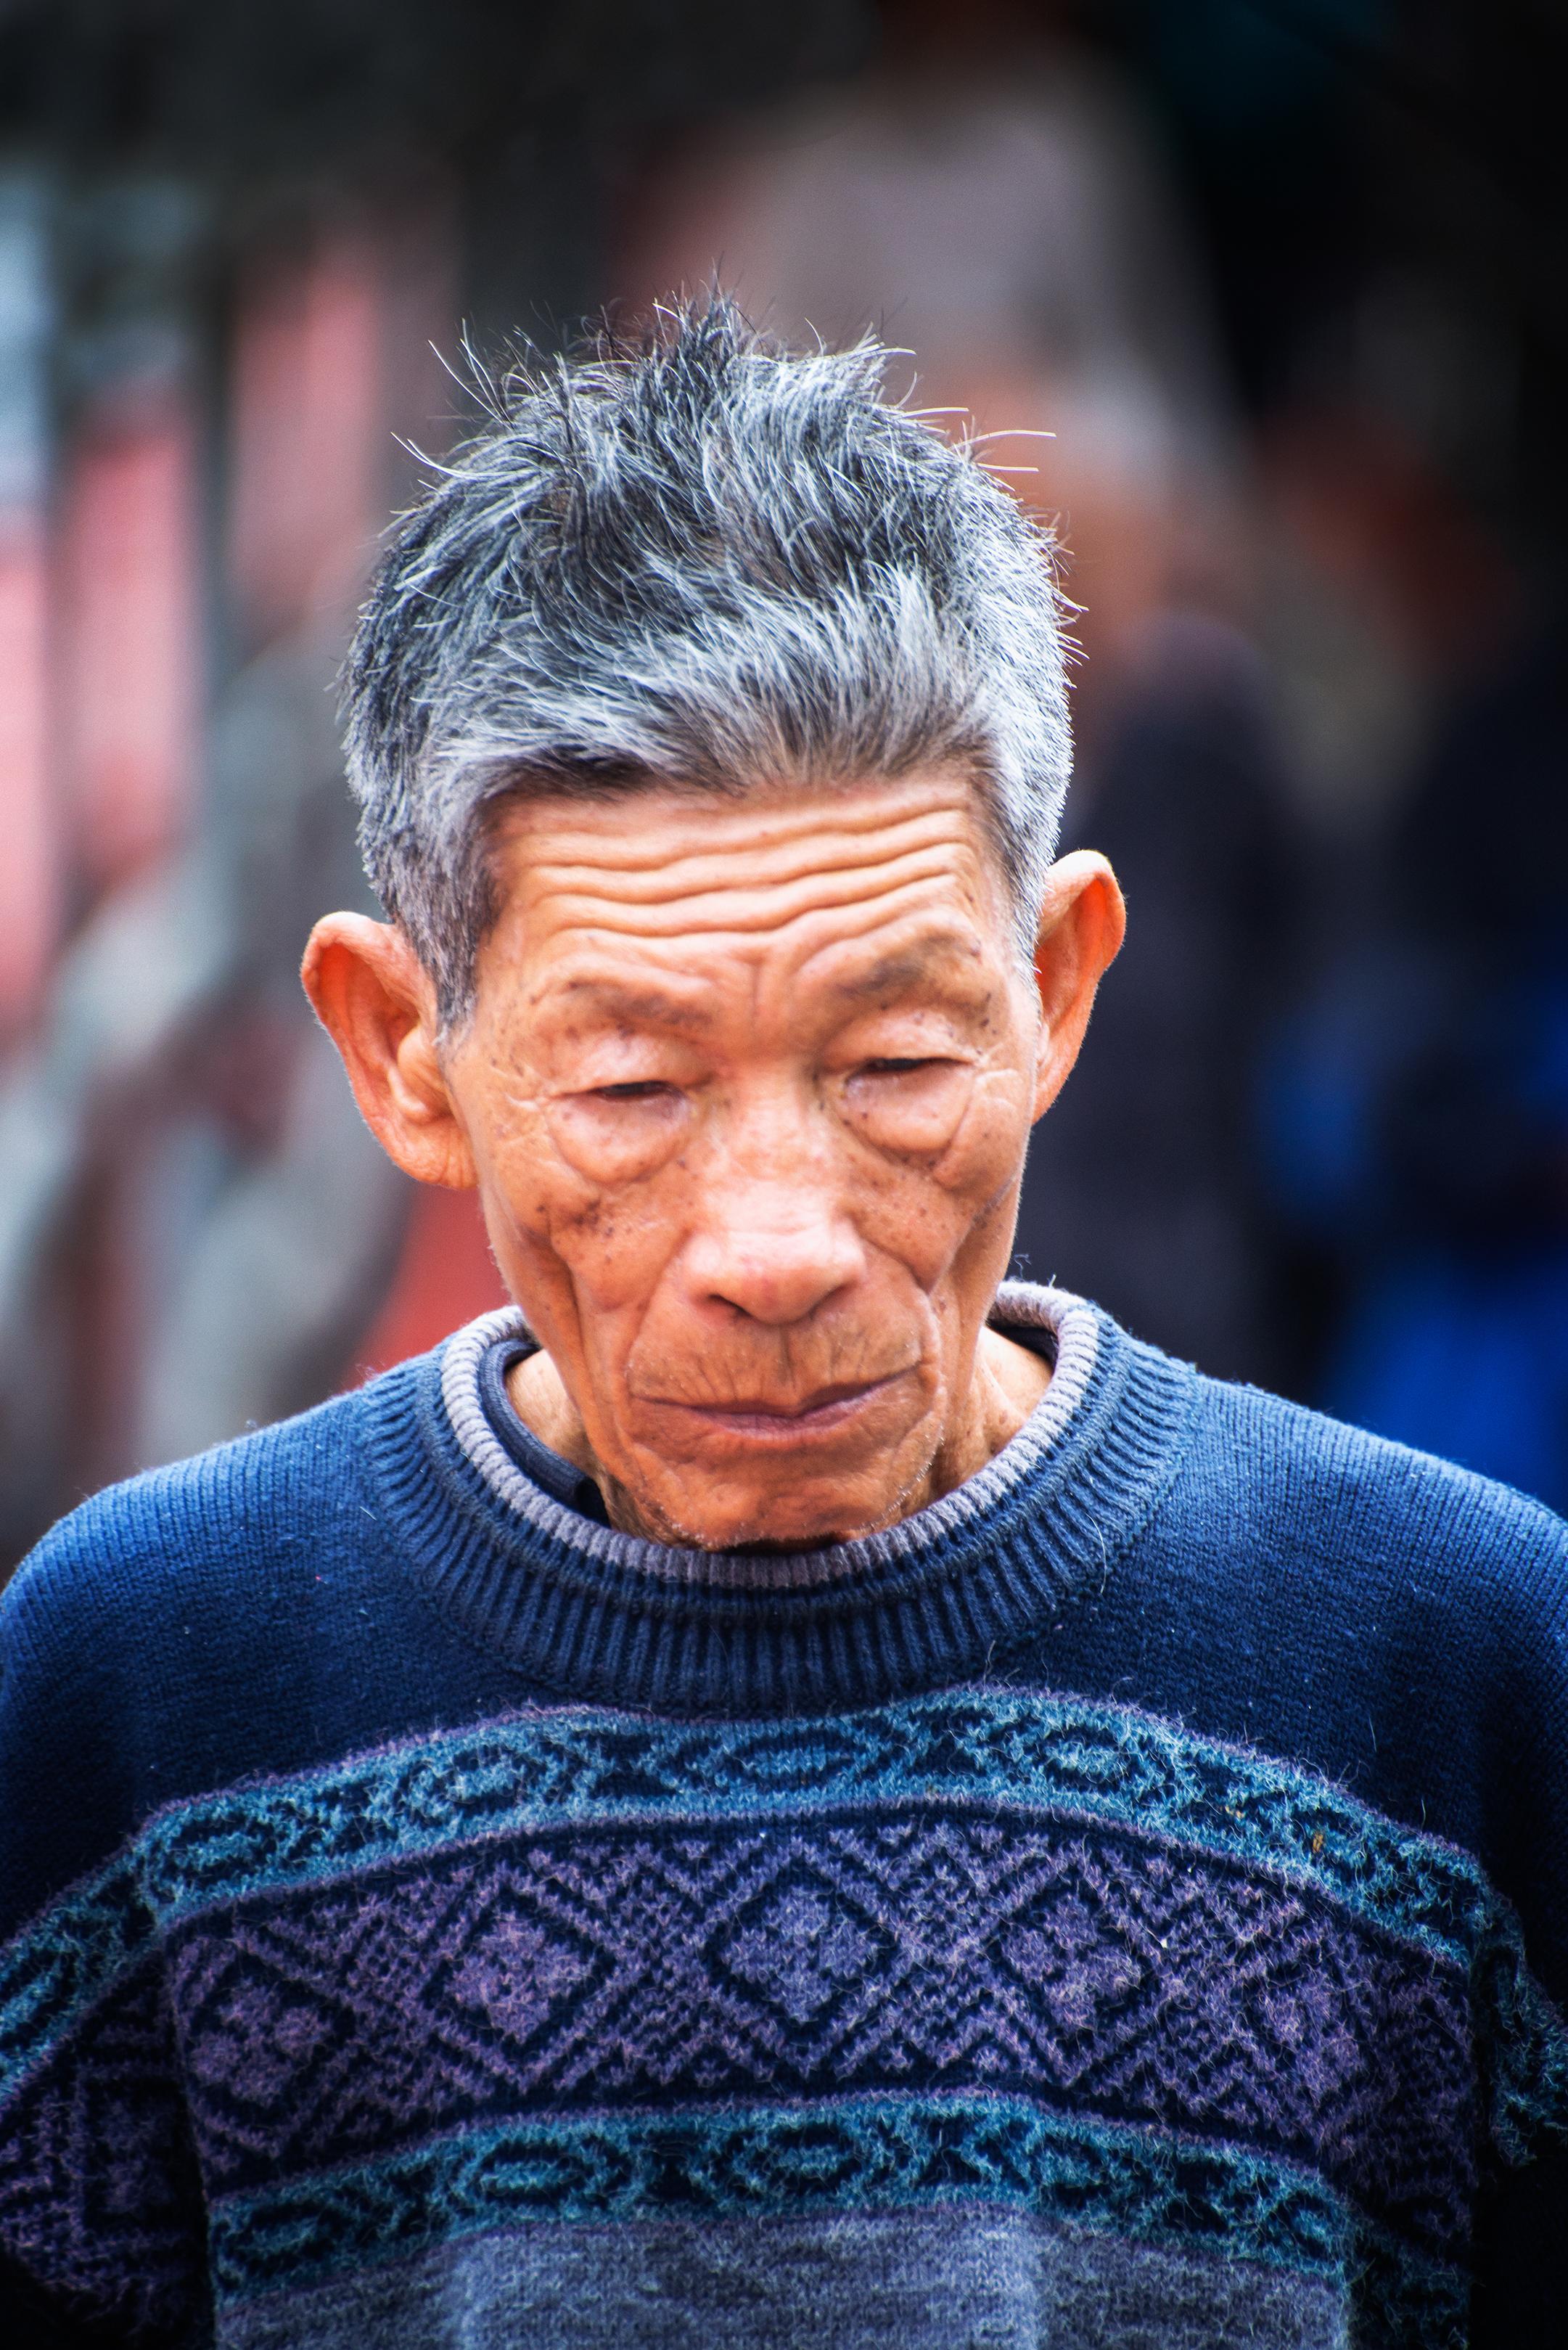 Man in Blue Sweater Chinatown San Franci